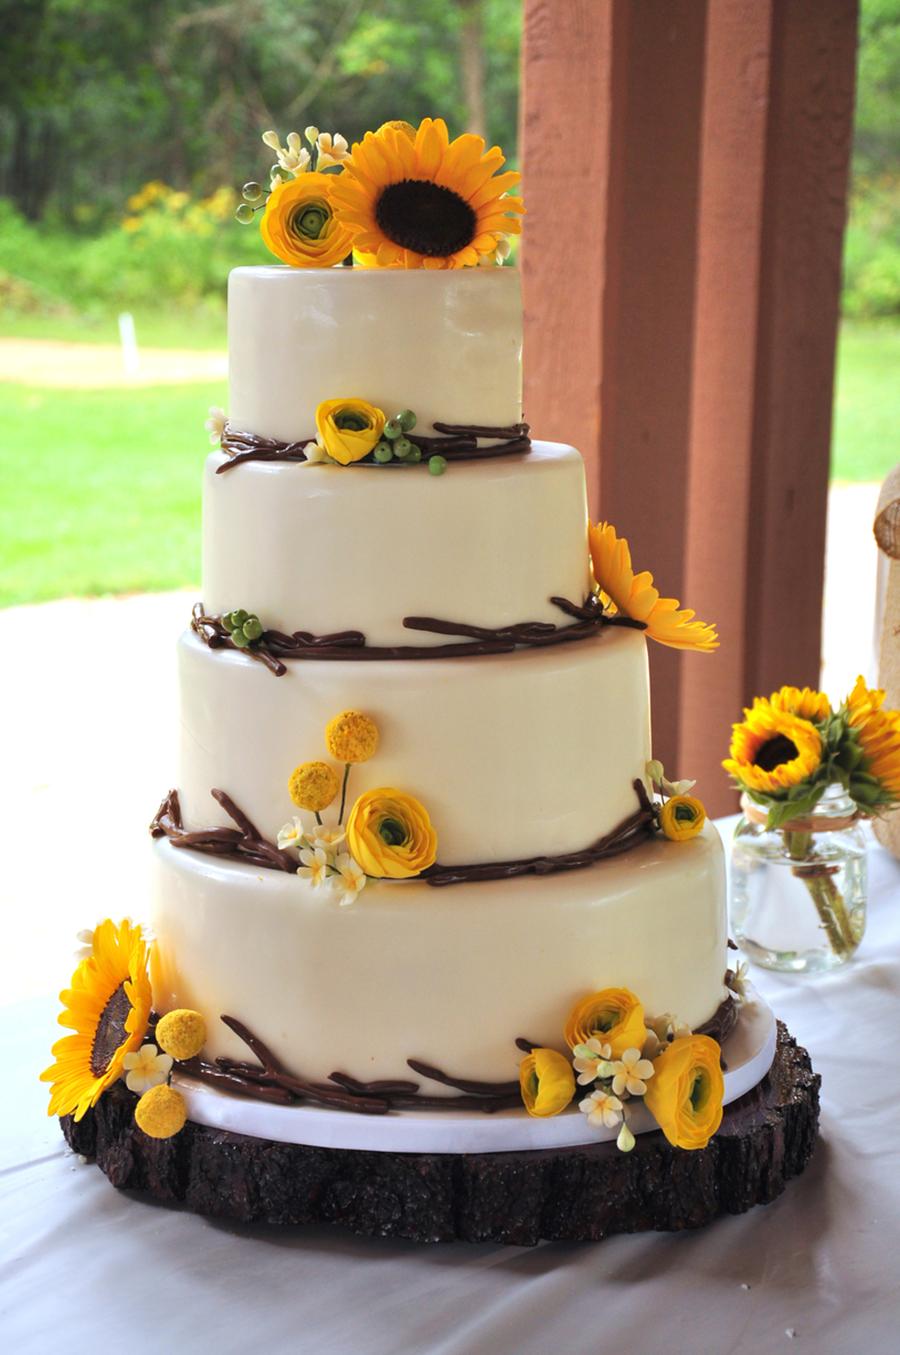 Modern Rustic Wedding Cake For An Outdoor Wedding 4 Offset